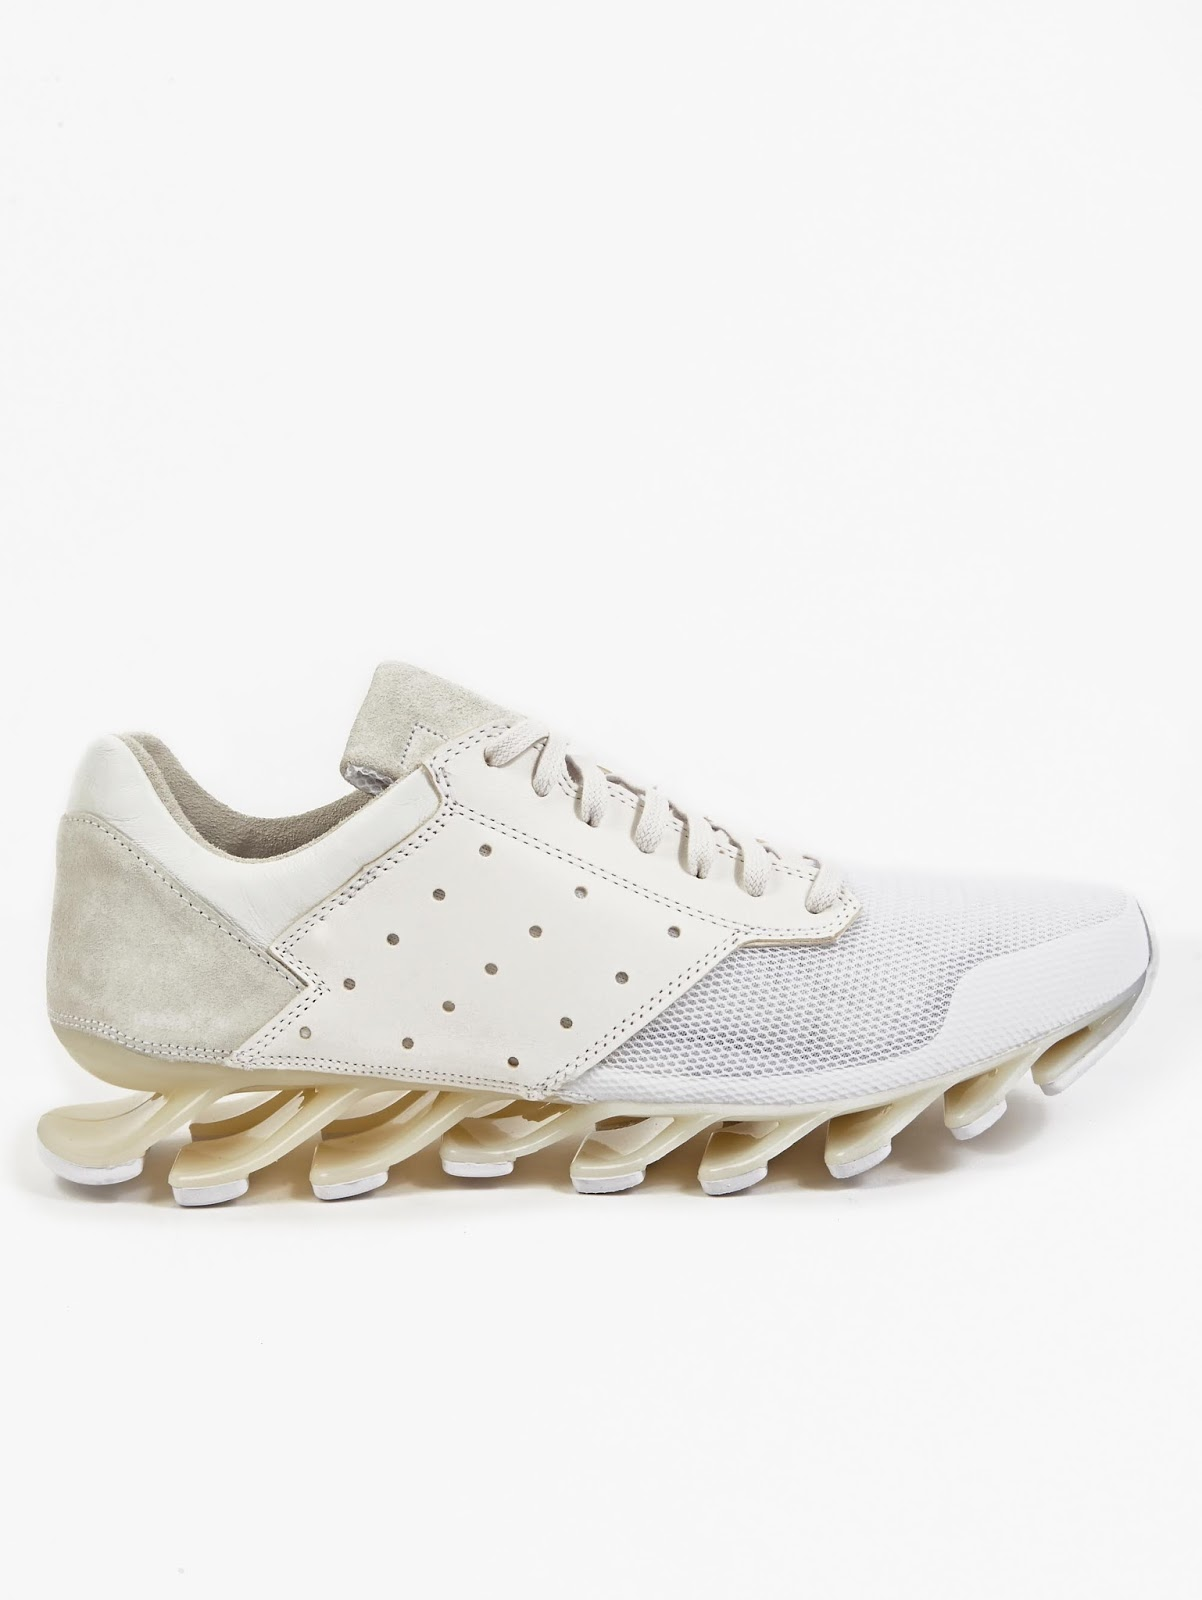 adidas-rick-owens-minimalist-edgy-sneakers4.jpg